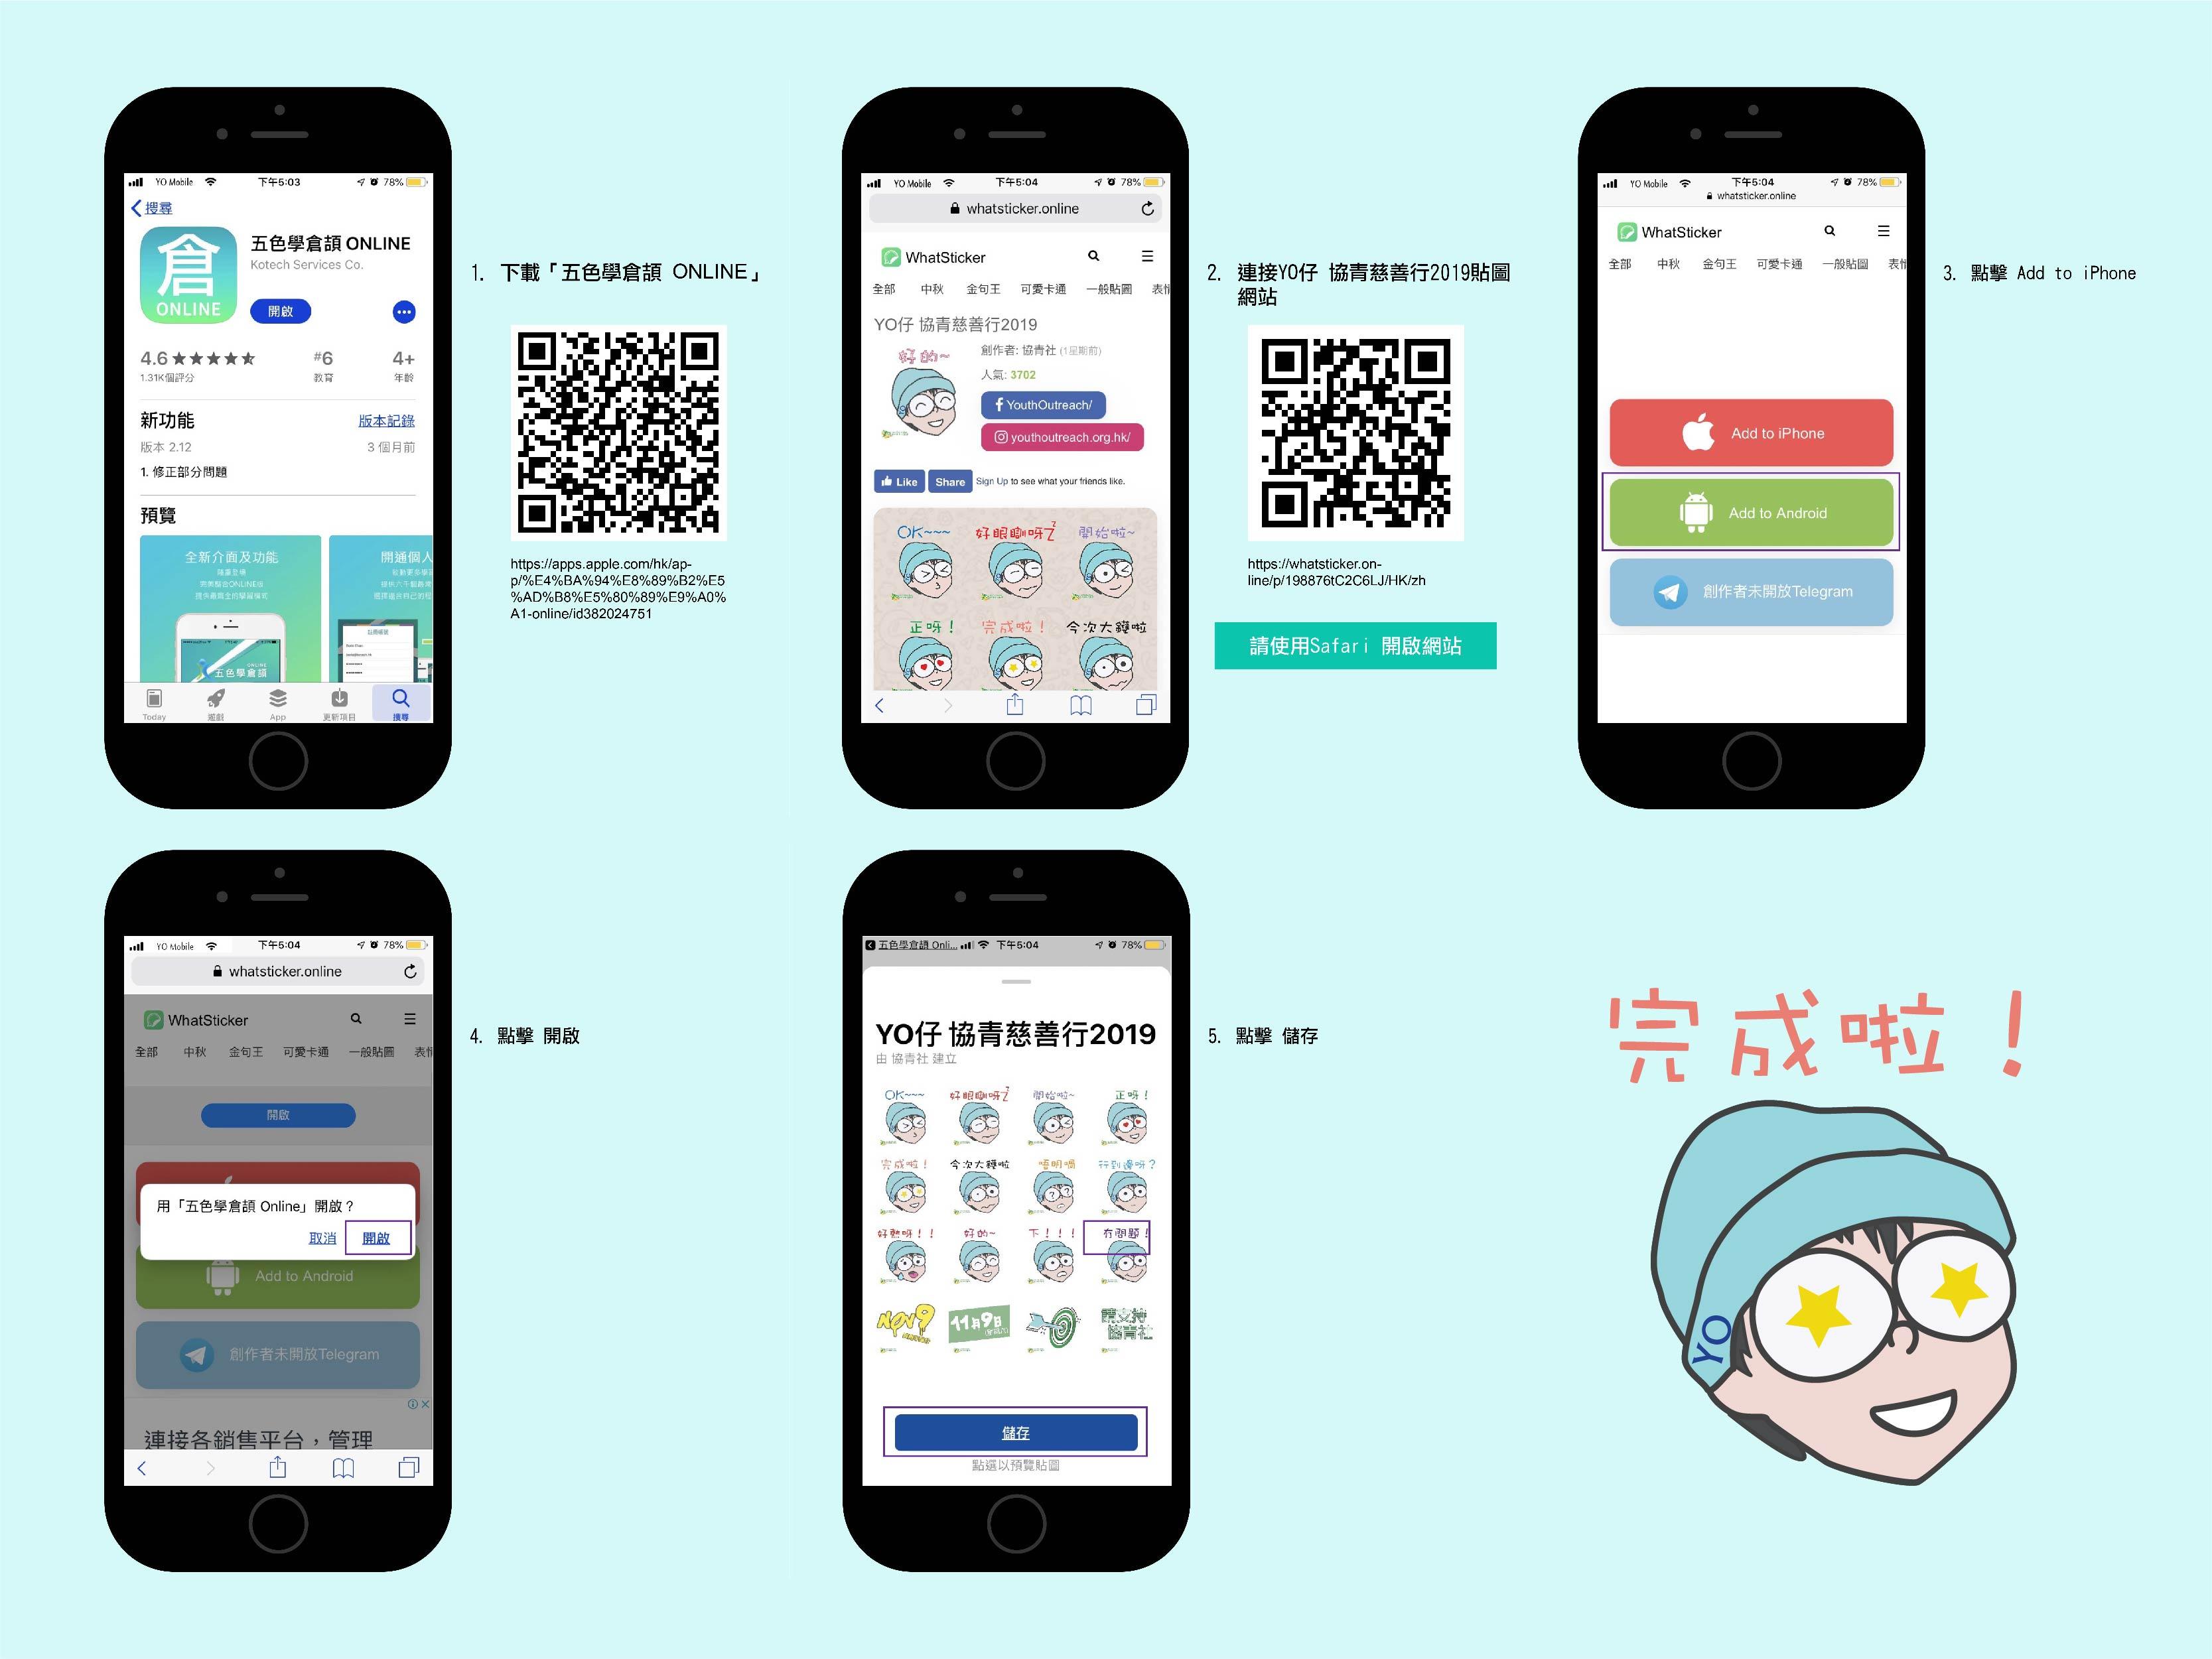 whatsapp-sticker-download-steps_ios_all.jpg (498 KB)